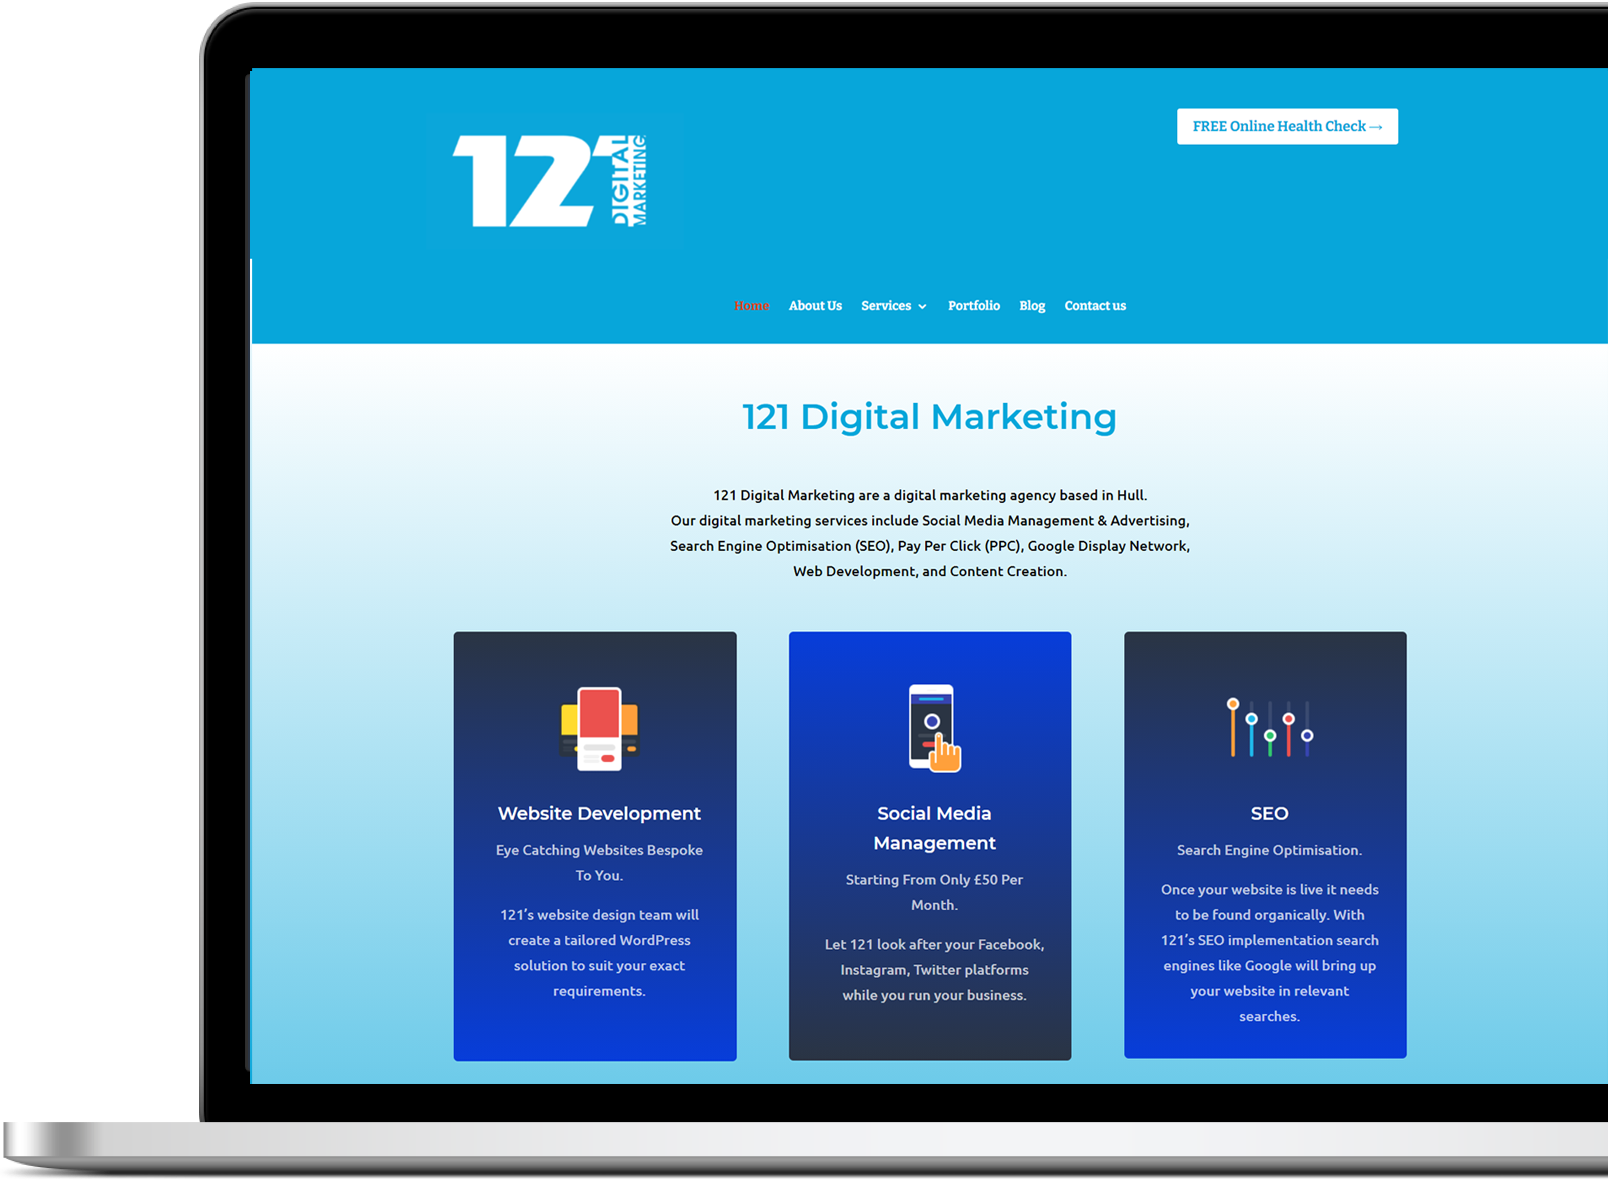 121 digital marketing